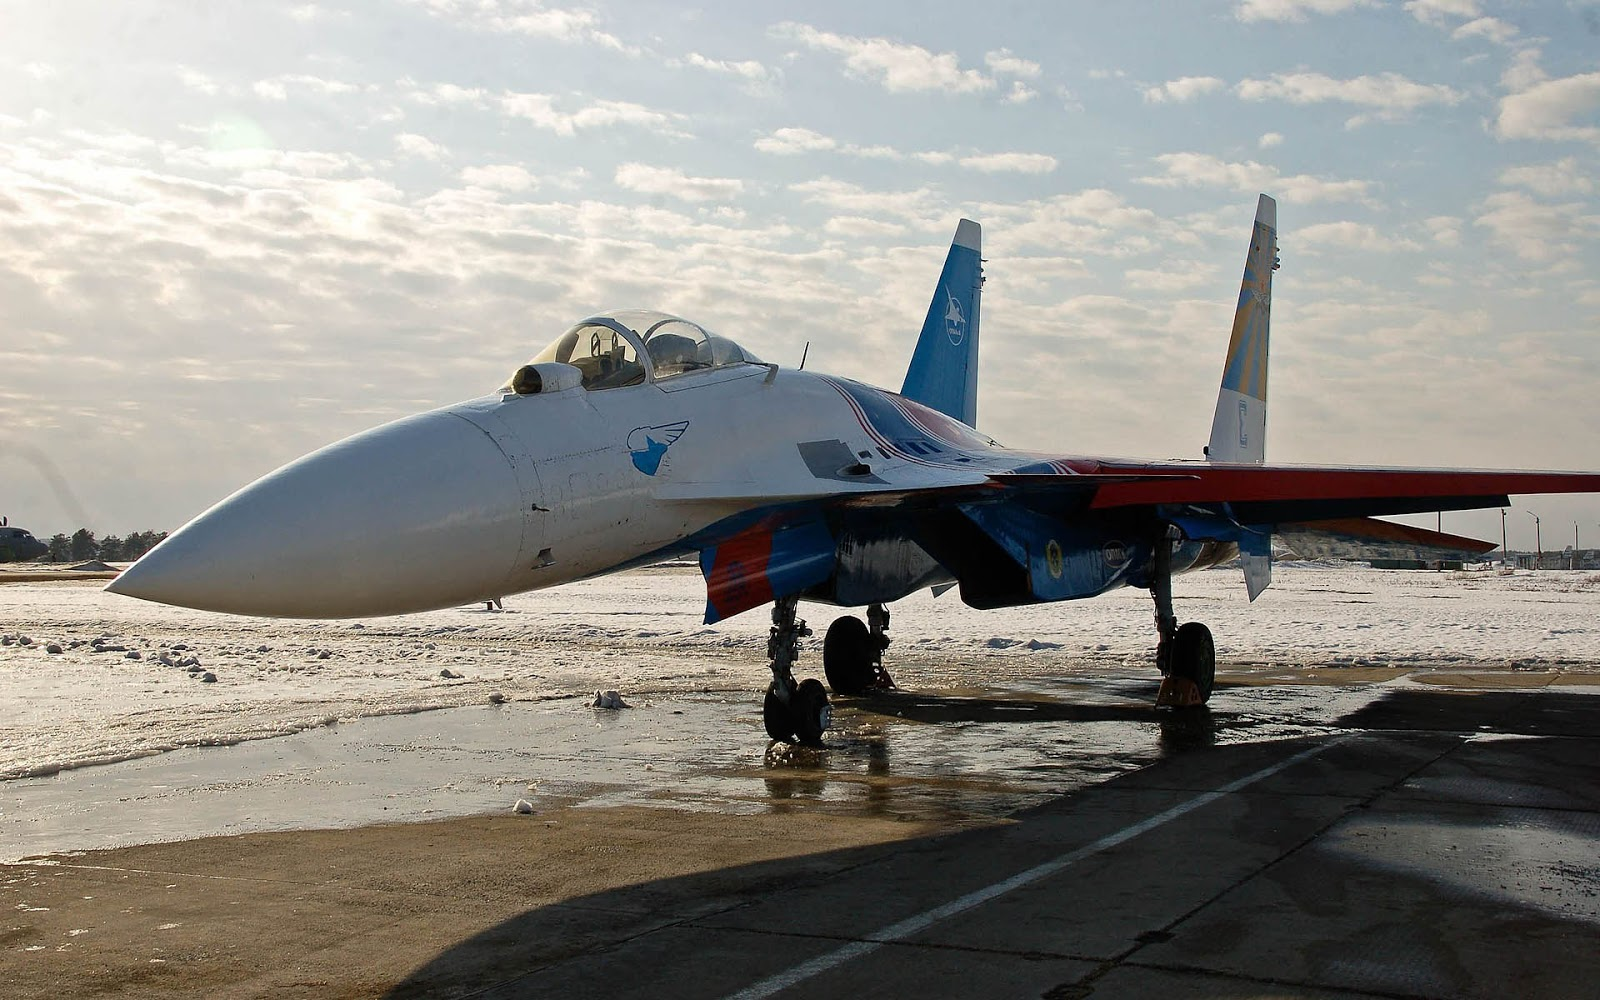 http://2.bp.blogspot.com/-I7yeNb3iiBA/UHWGNAdSCbI/AAAAAAAAGLA/g0Qd8WRIq0o/s1600/vliegtuig-wallpaper-met-een-russische-sukhoi-su-27-gevechtsvliegtuig-op-de-grond.jpg